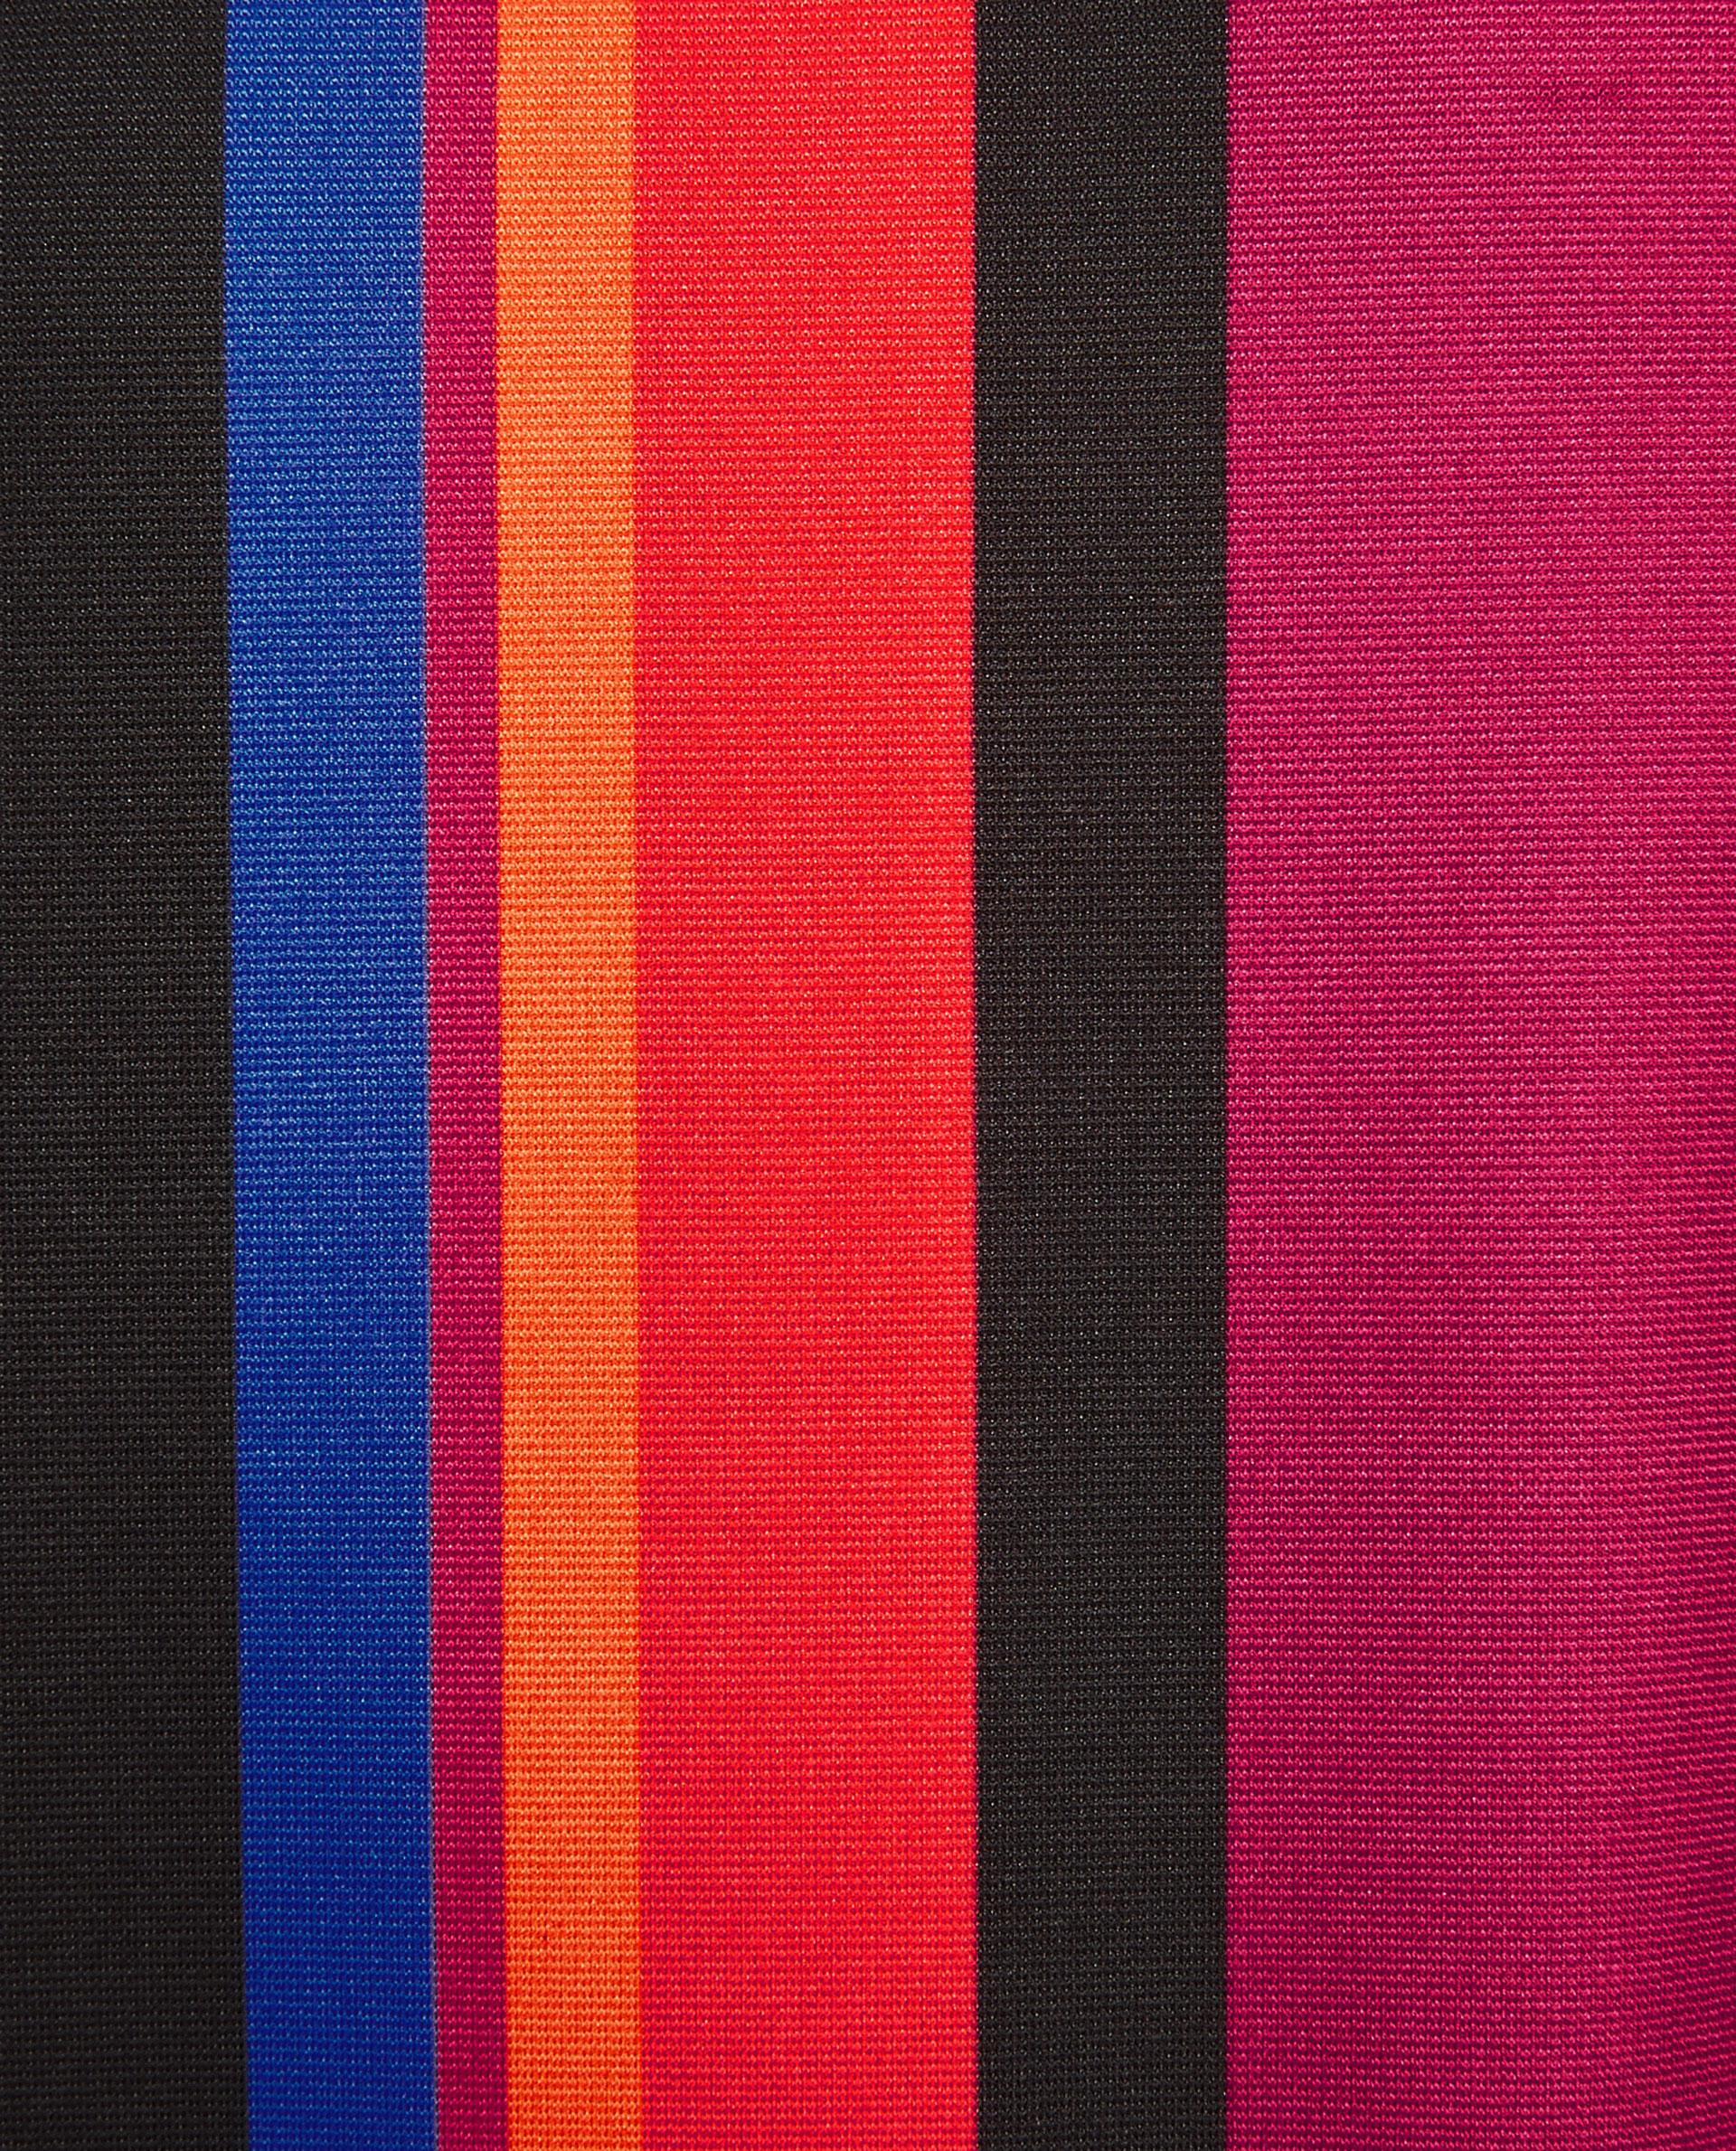 Sayuri Villalba | Zara Print Pattern